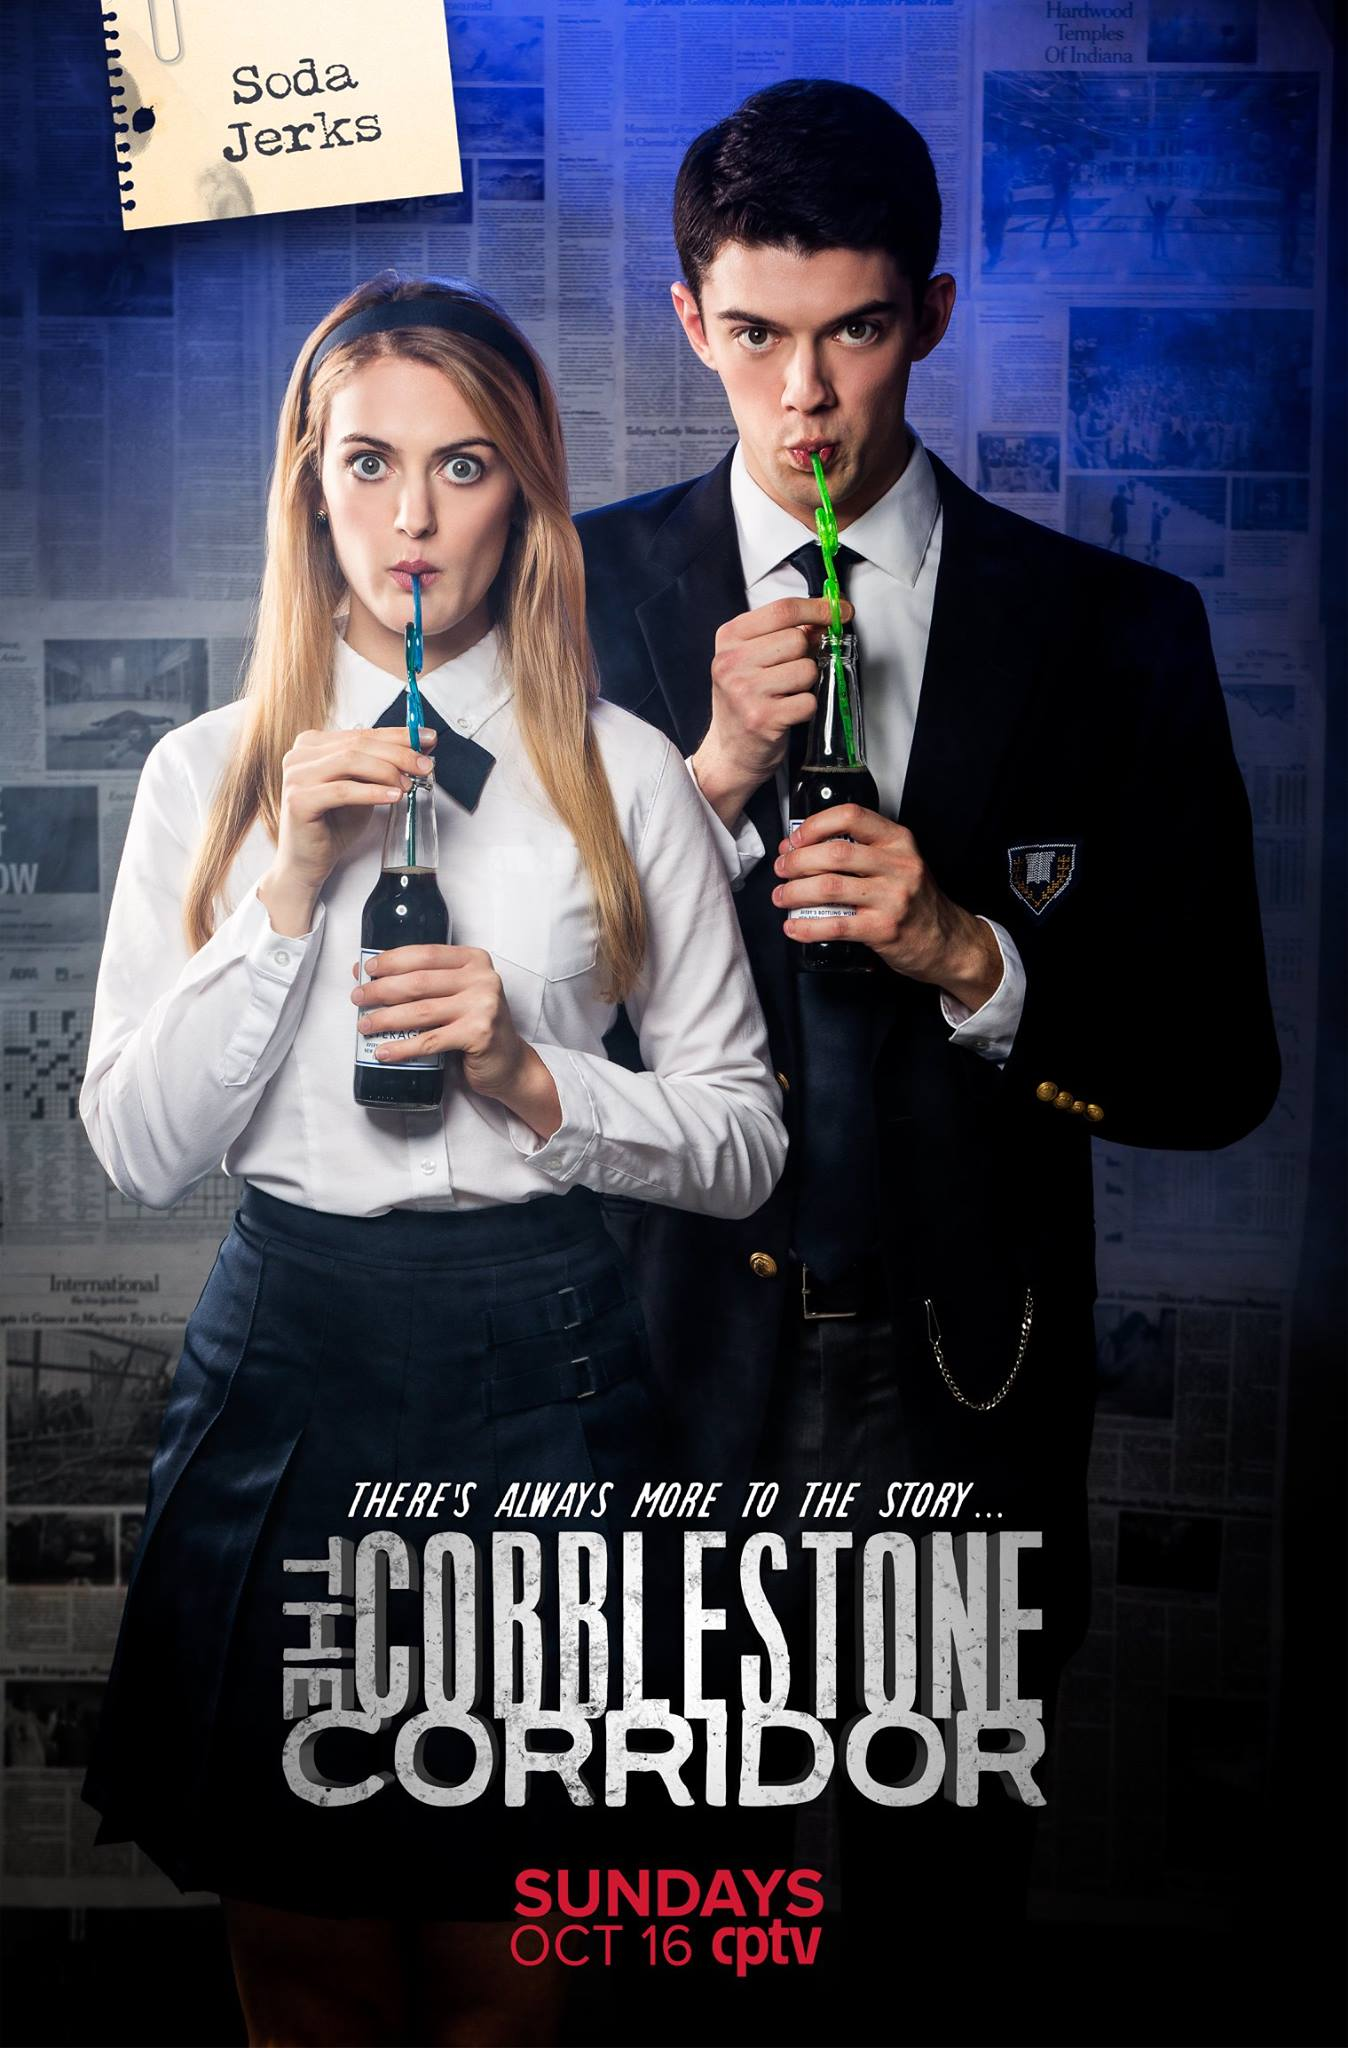 The Cobblestone Corridor |Murphy Made Photography